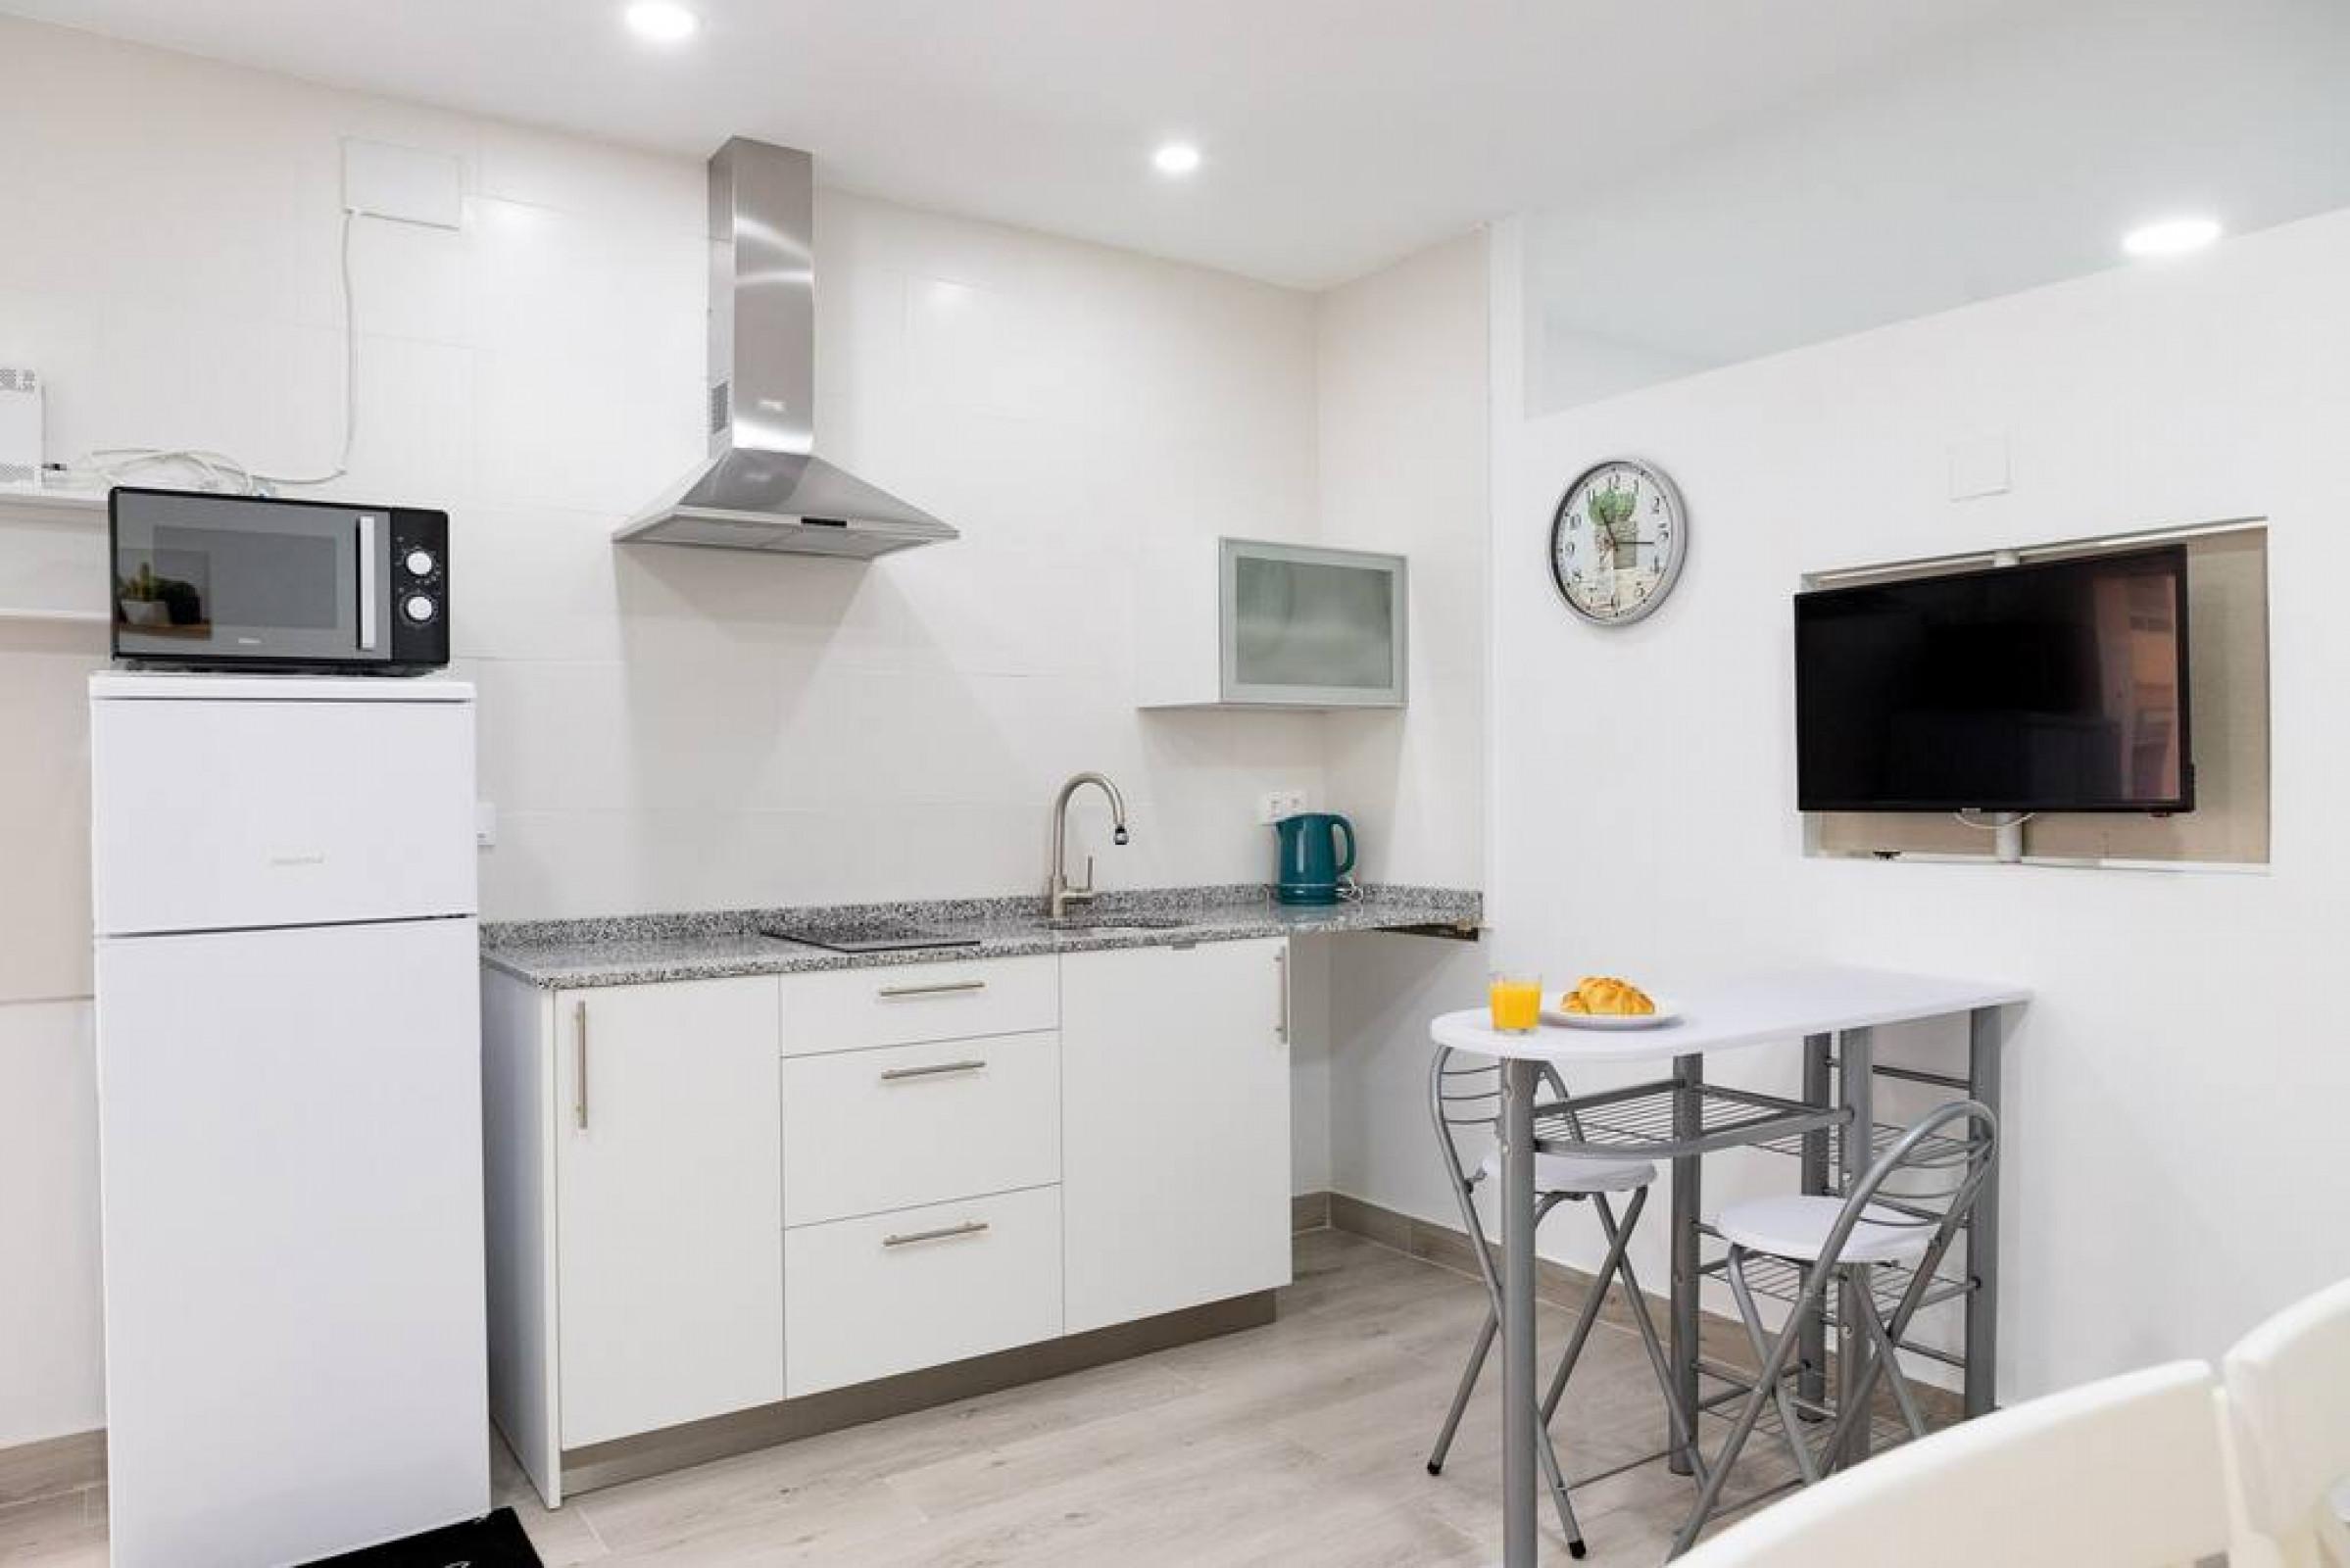 Gral. Serrano 14-A · Moonkey - Apartamento Amaralba A